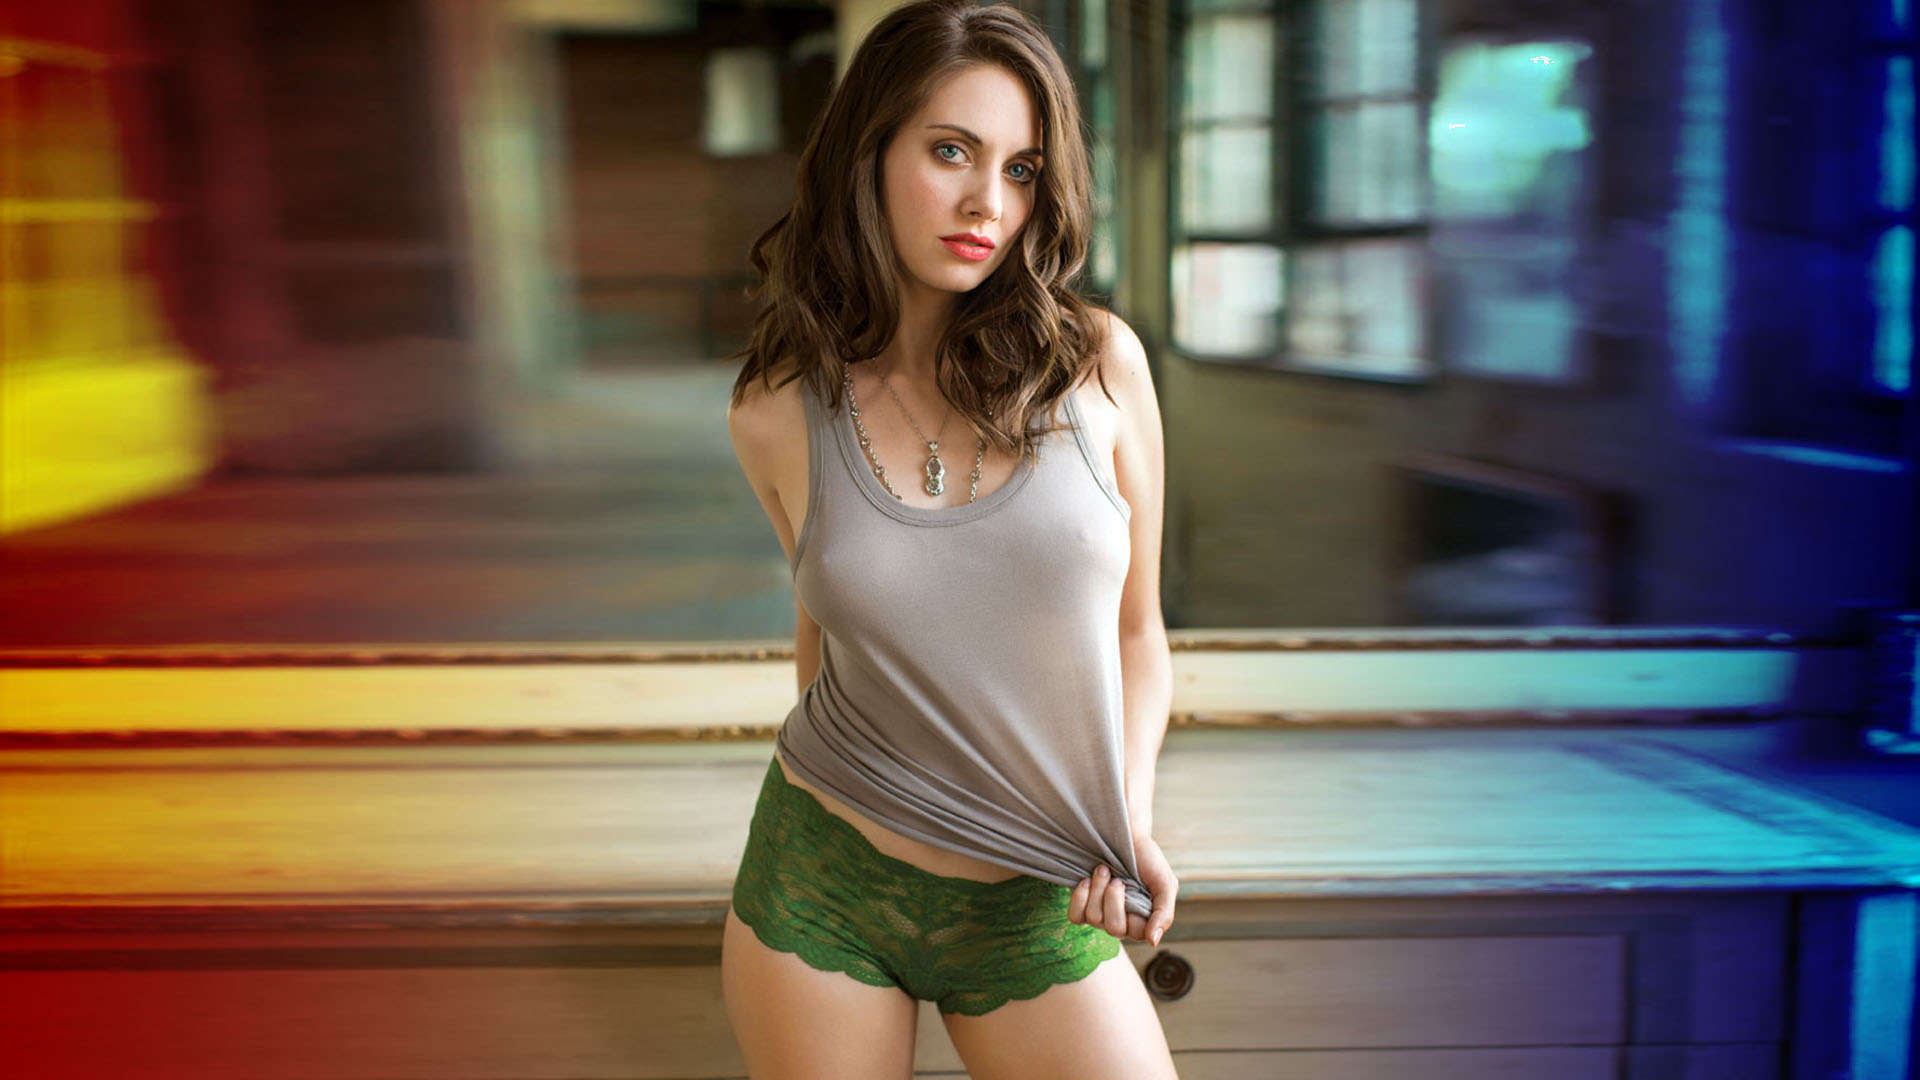 Alison Brie Images